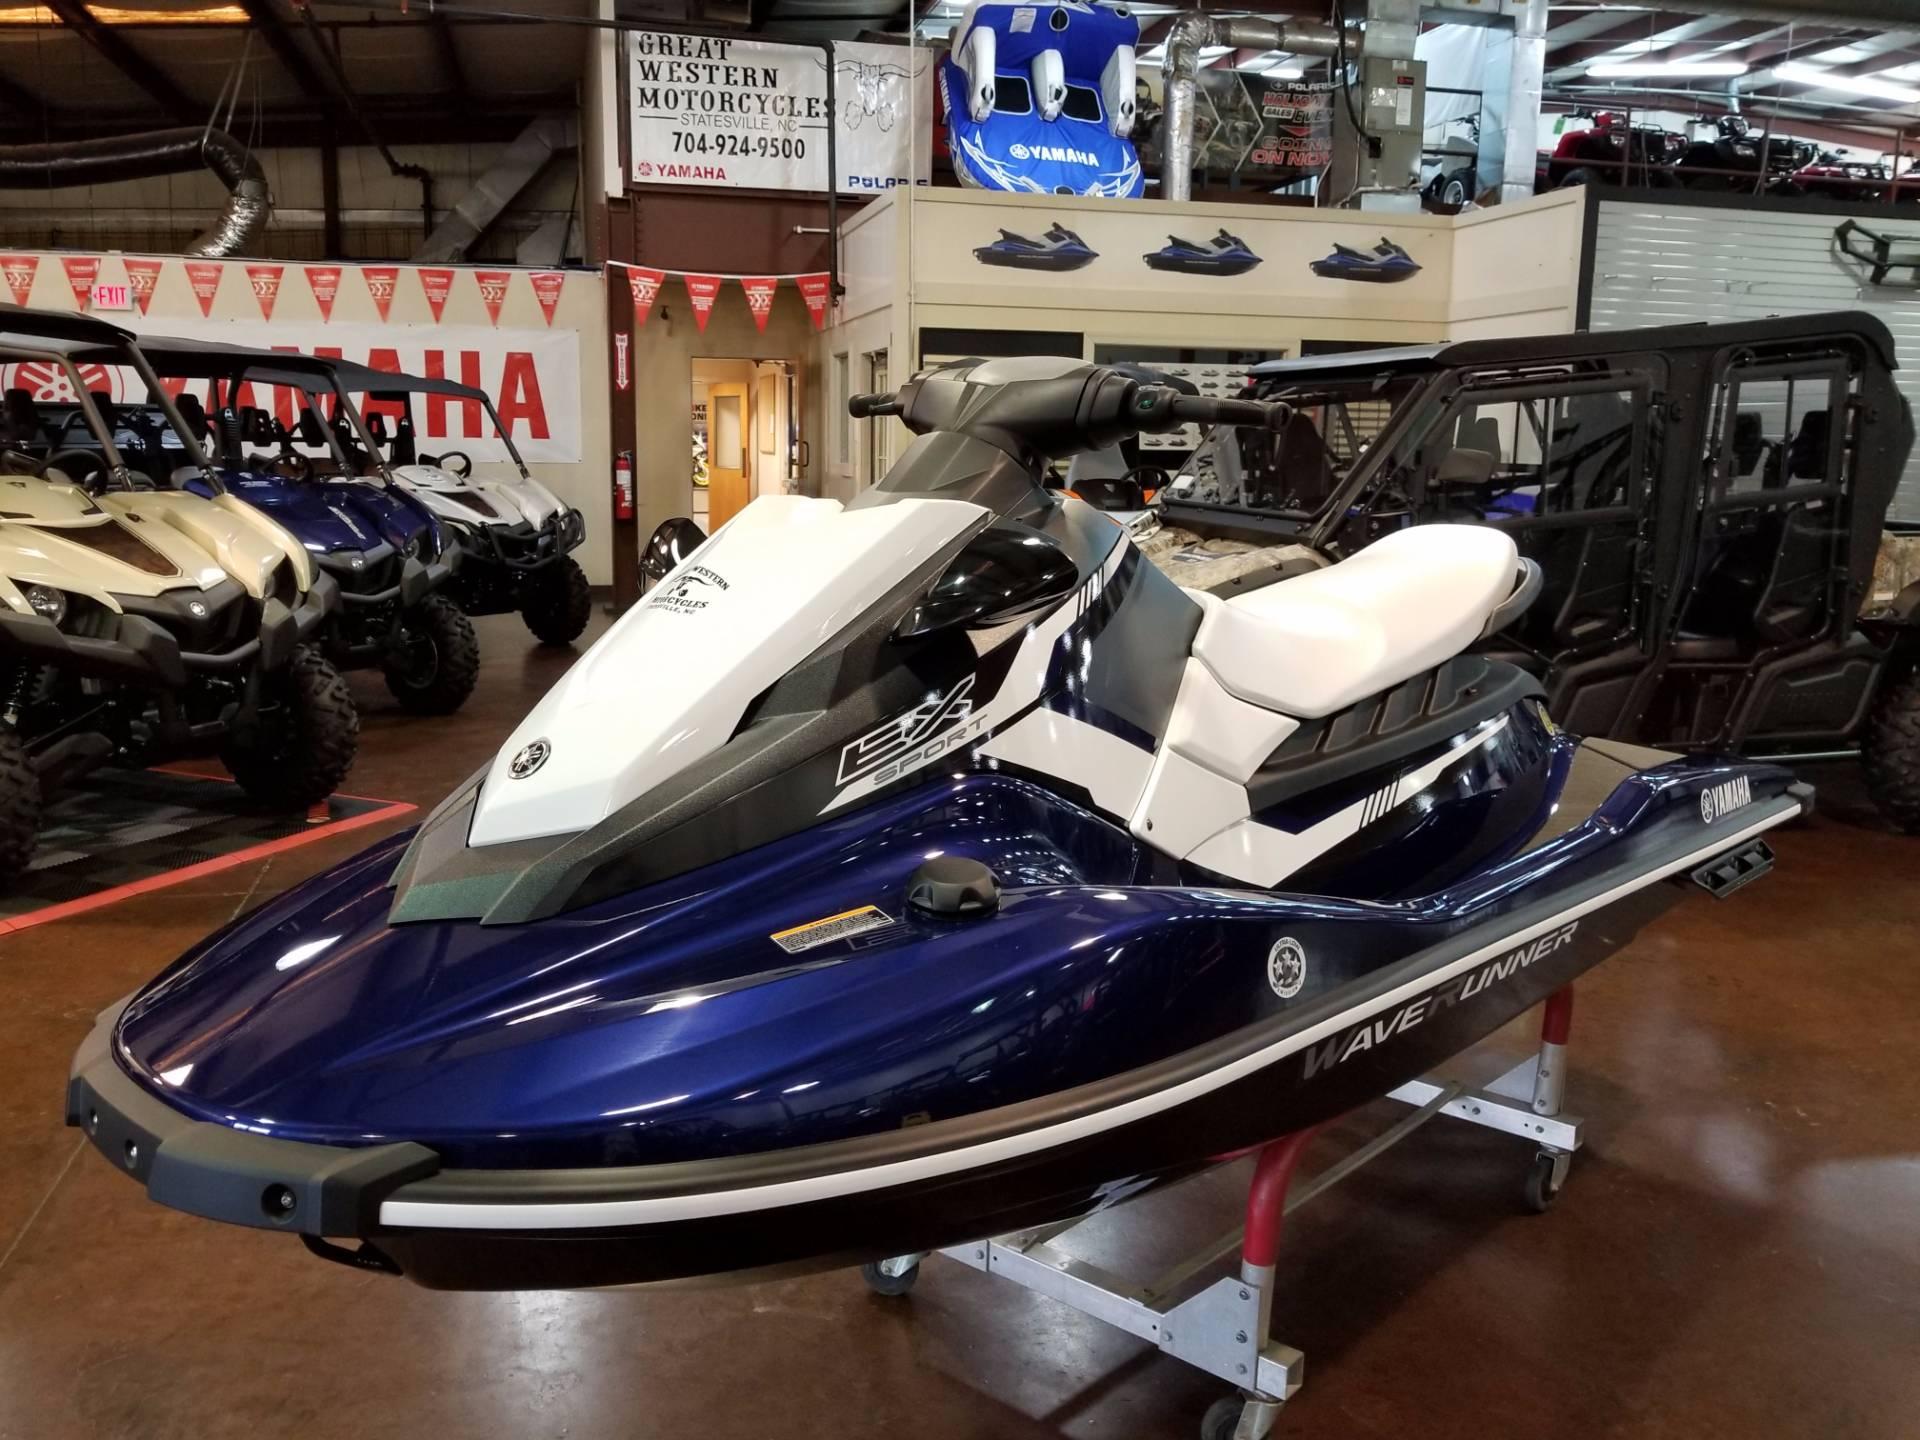 New 2018 yamaha ex sport watercraft in statesville nc for Yamaha ex waverunner